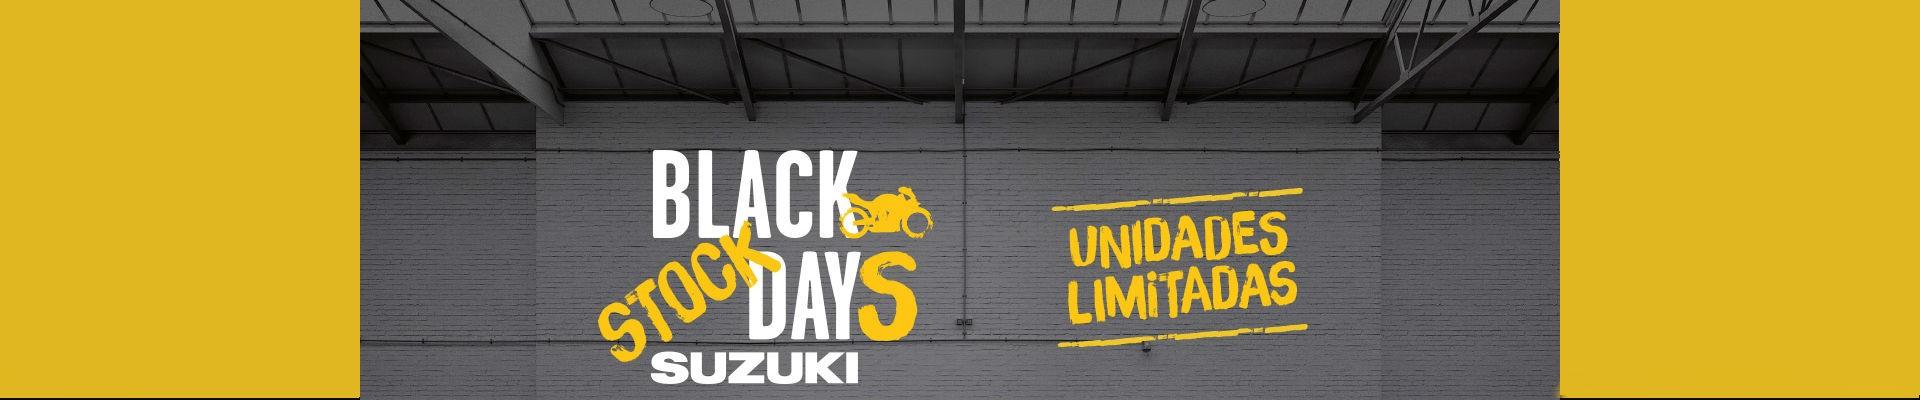 SUZUKI BLACK STOCK DAYS